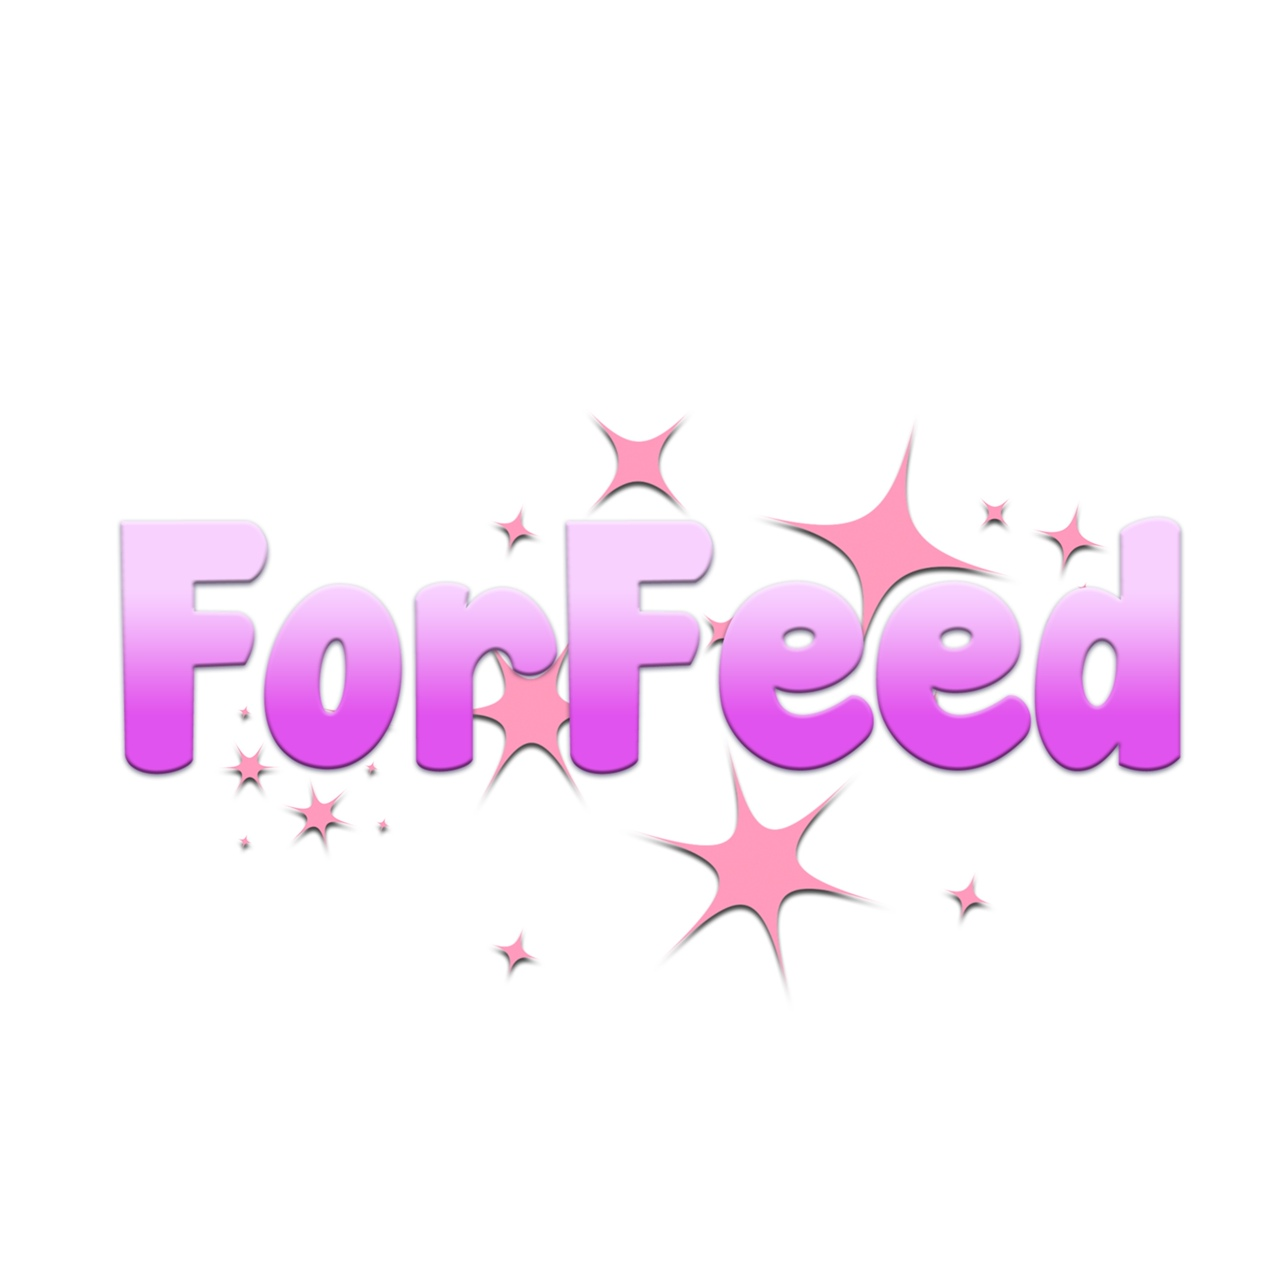 Forfeed